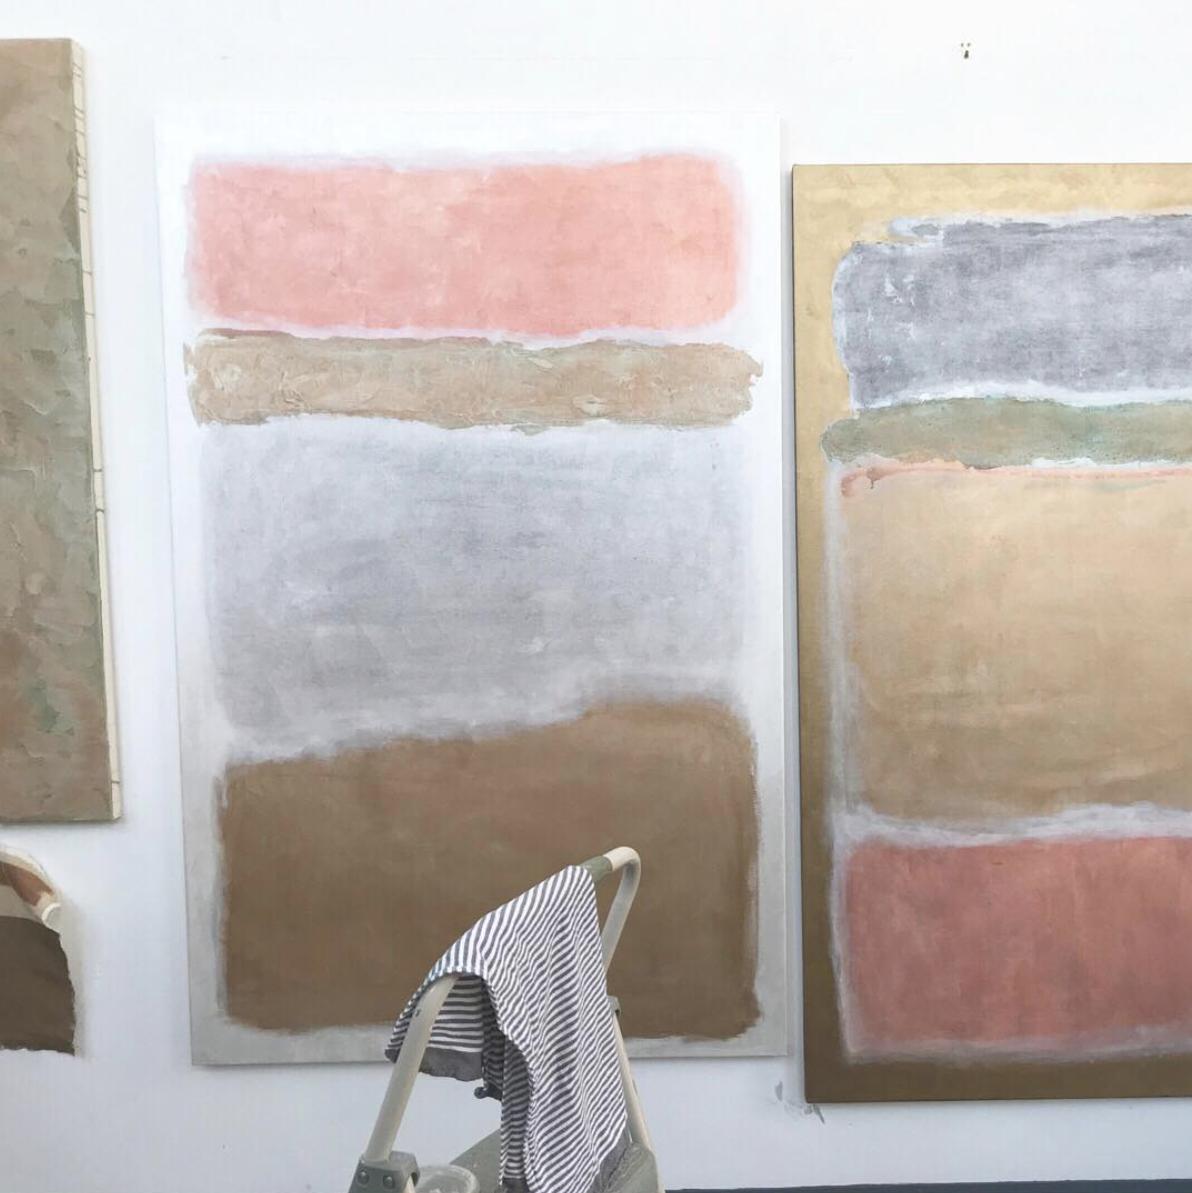 Mark-Rothko-Painting-Inspiration-Marta-Staudinger